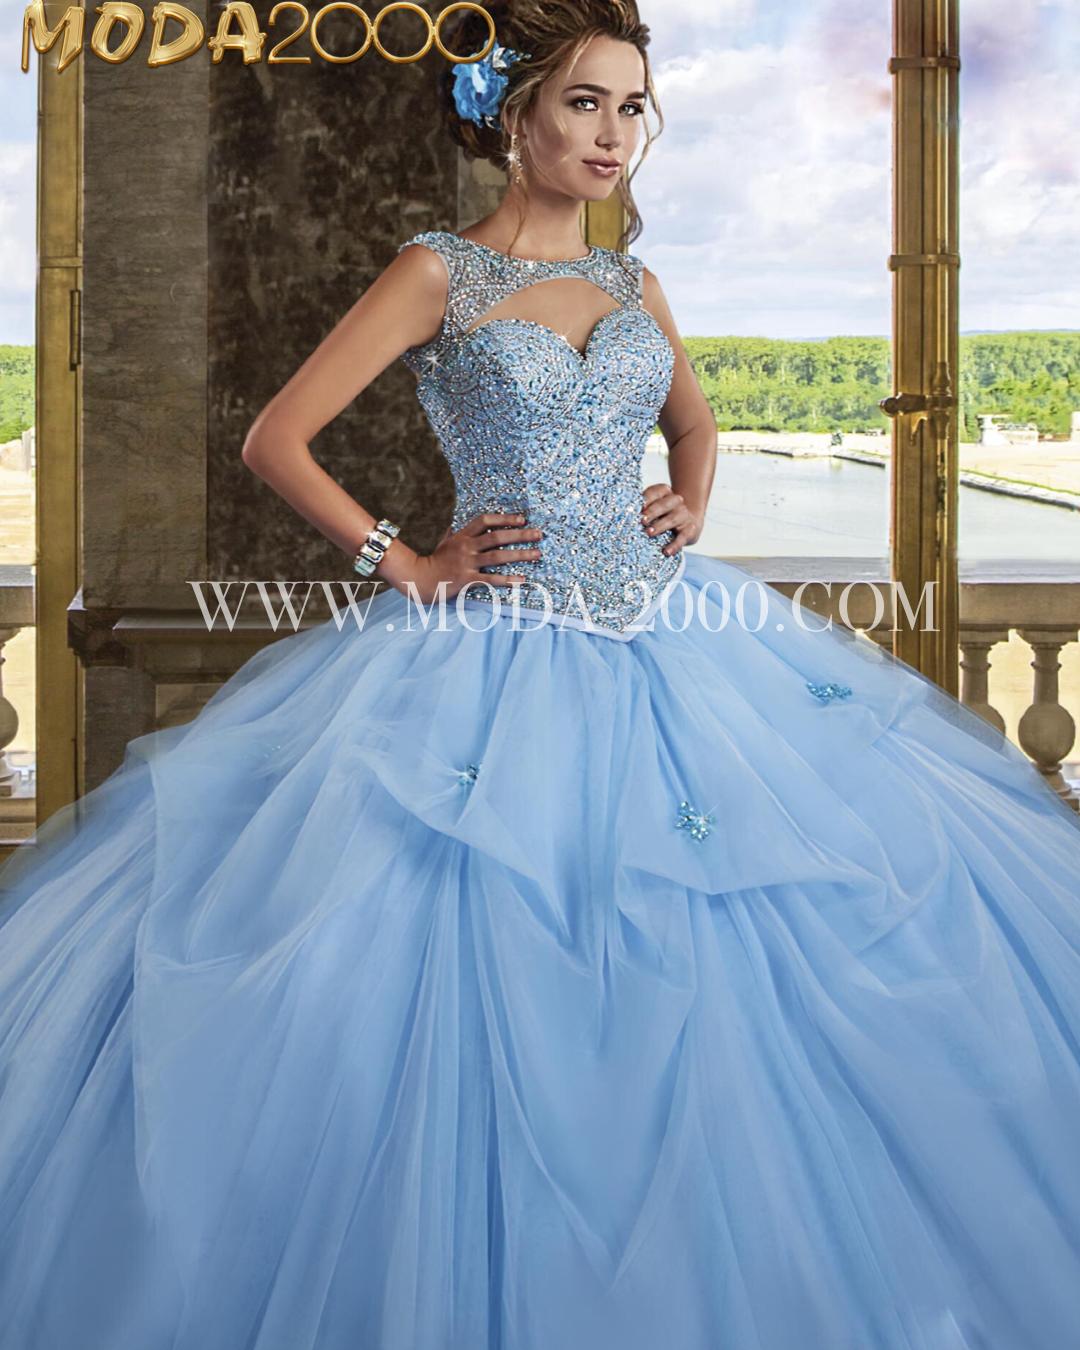 c2d87c1747 Cinderella blue quinceanera dress